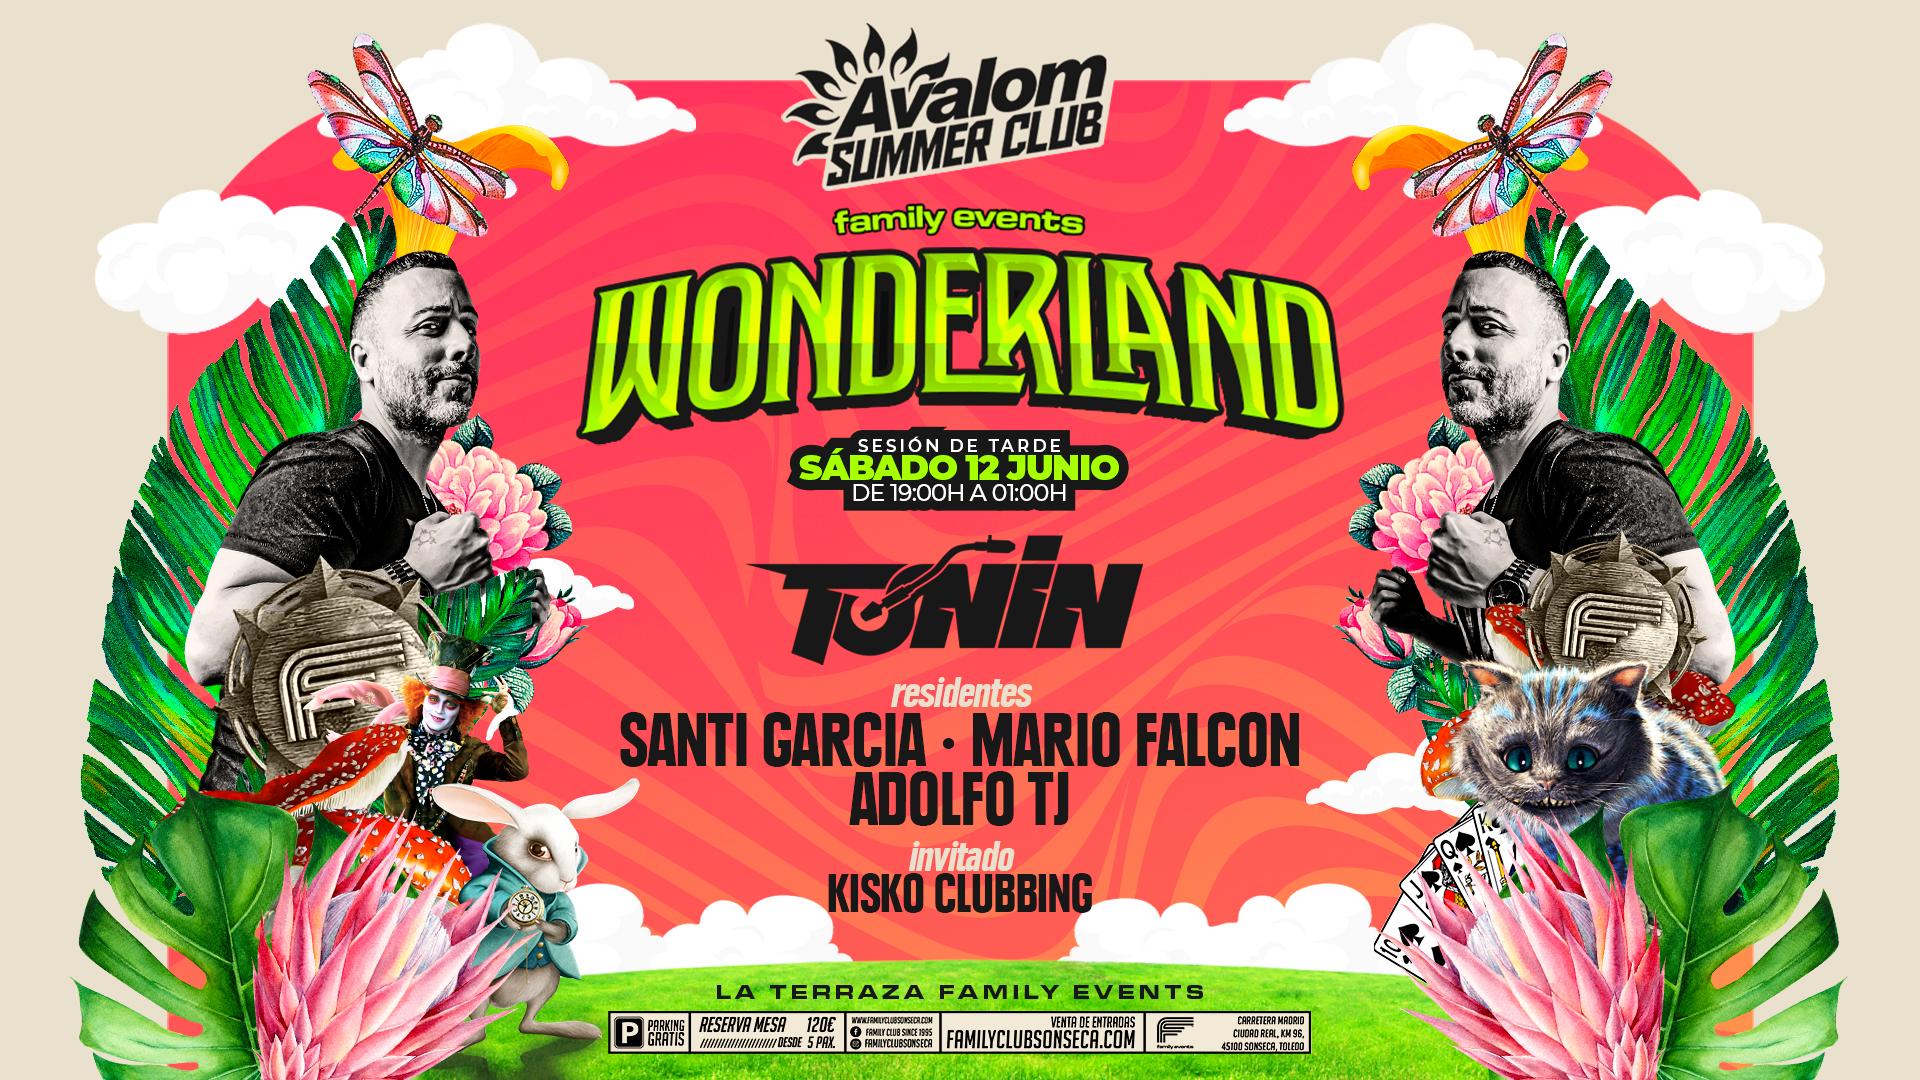 AVALOM SUMMER CLUB con DJ TOÑIN - FAMILY EVENTS